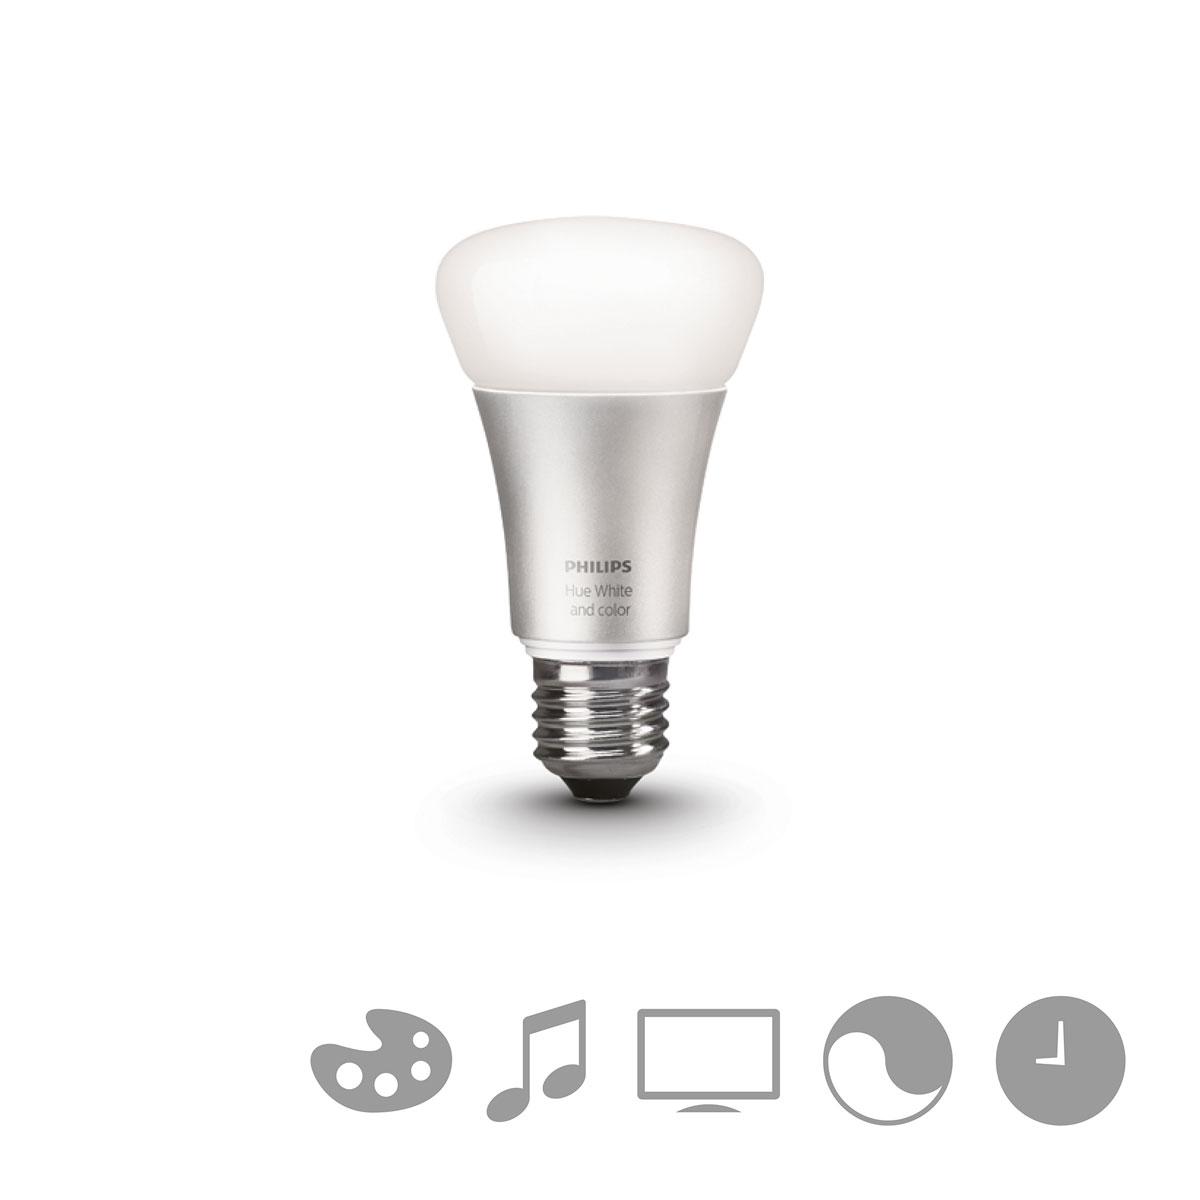 philips hue white and color starterset e27 a19 3 lampen met bridge 2 0. Black Bedroom Furniture Sets. Home Design Ideas